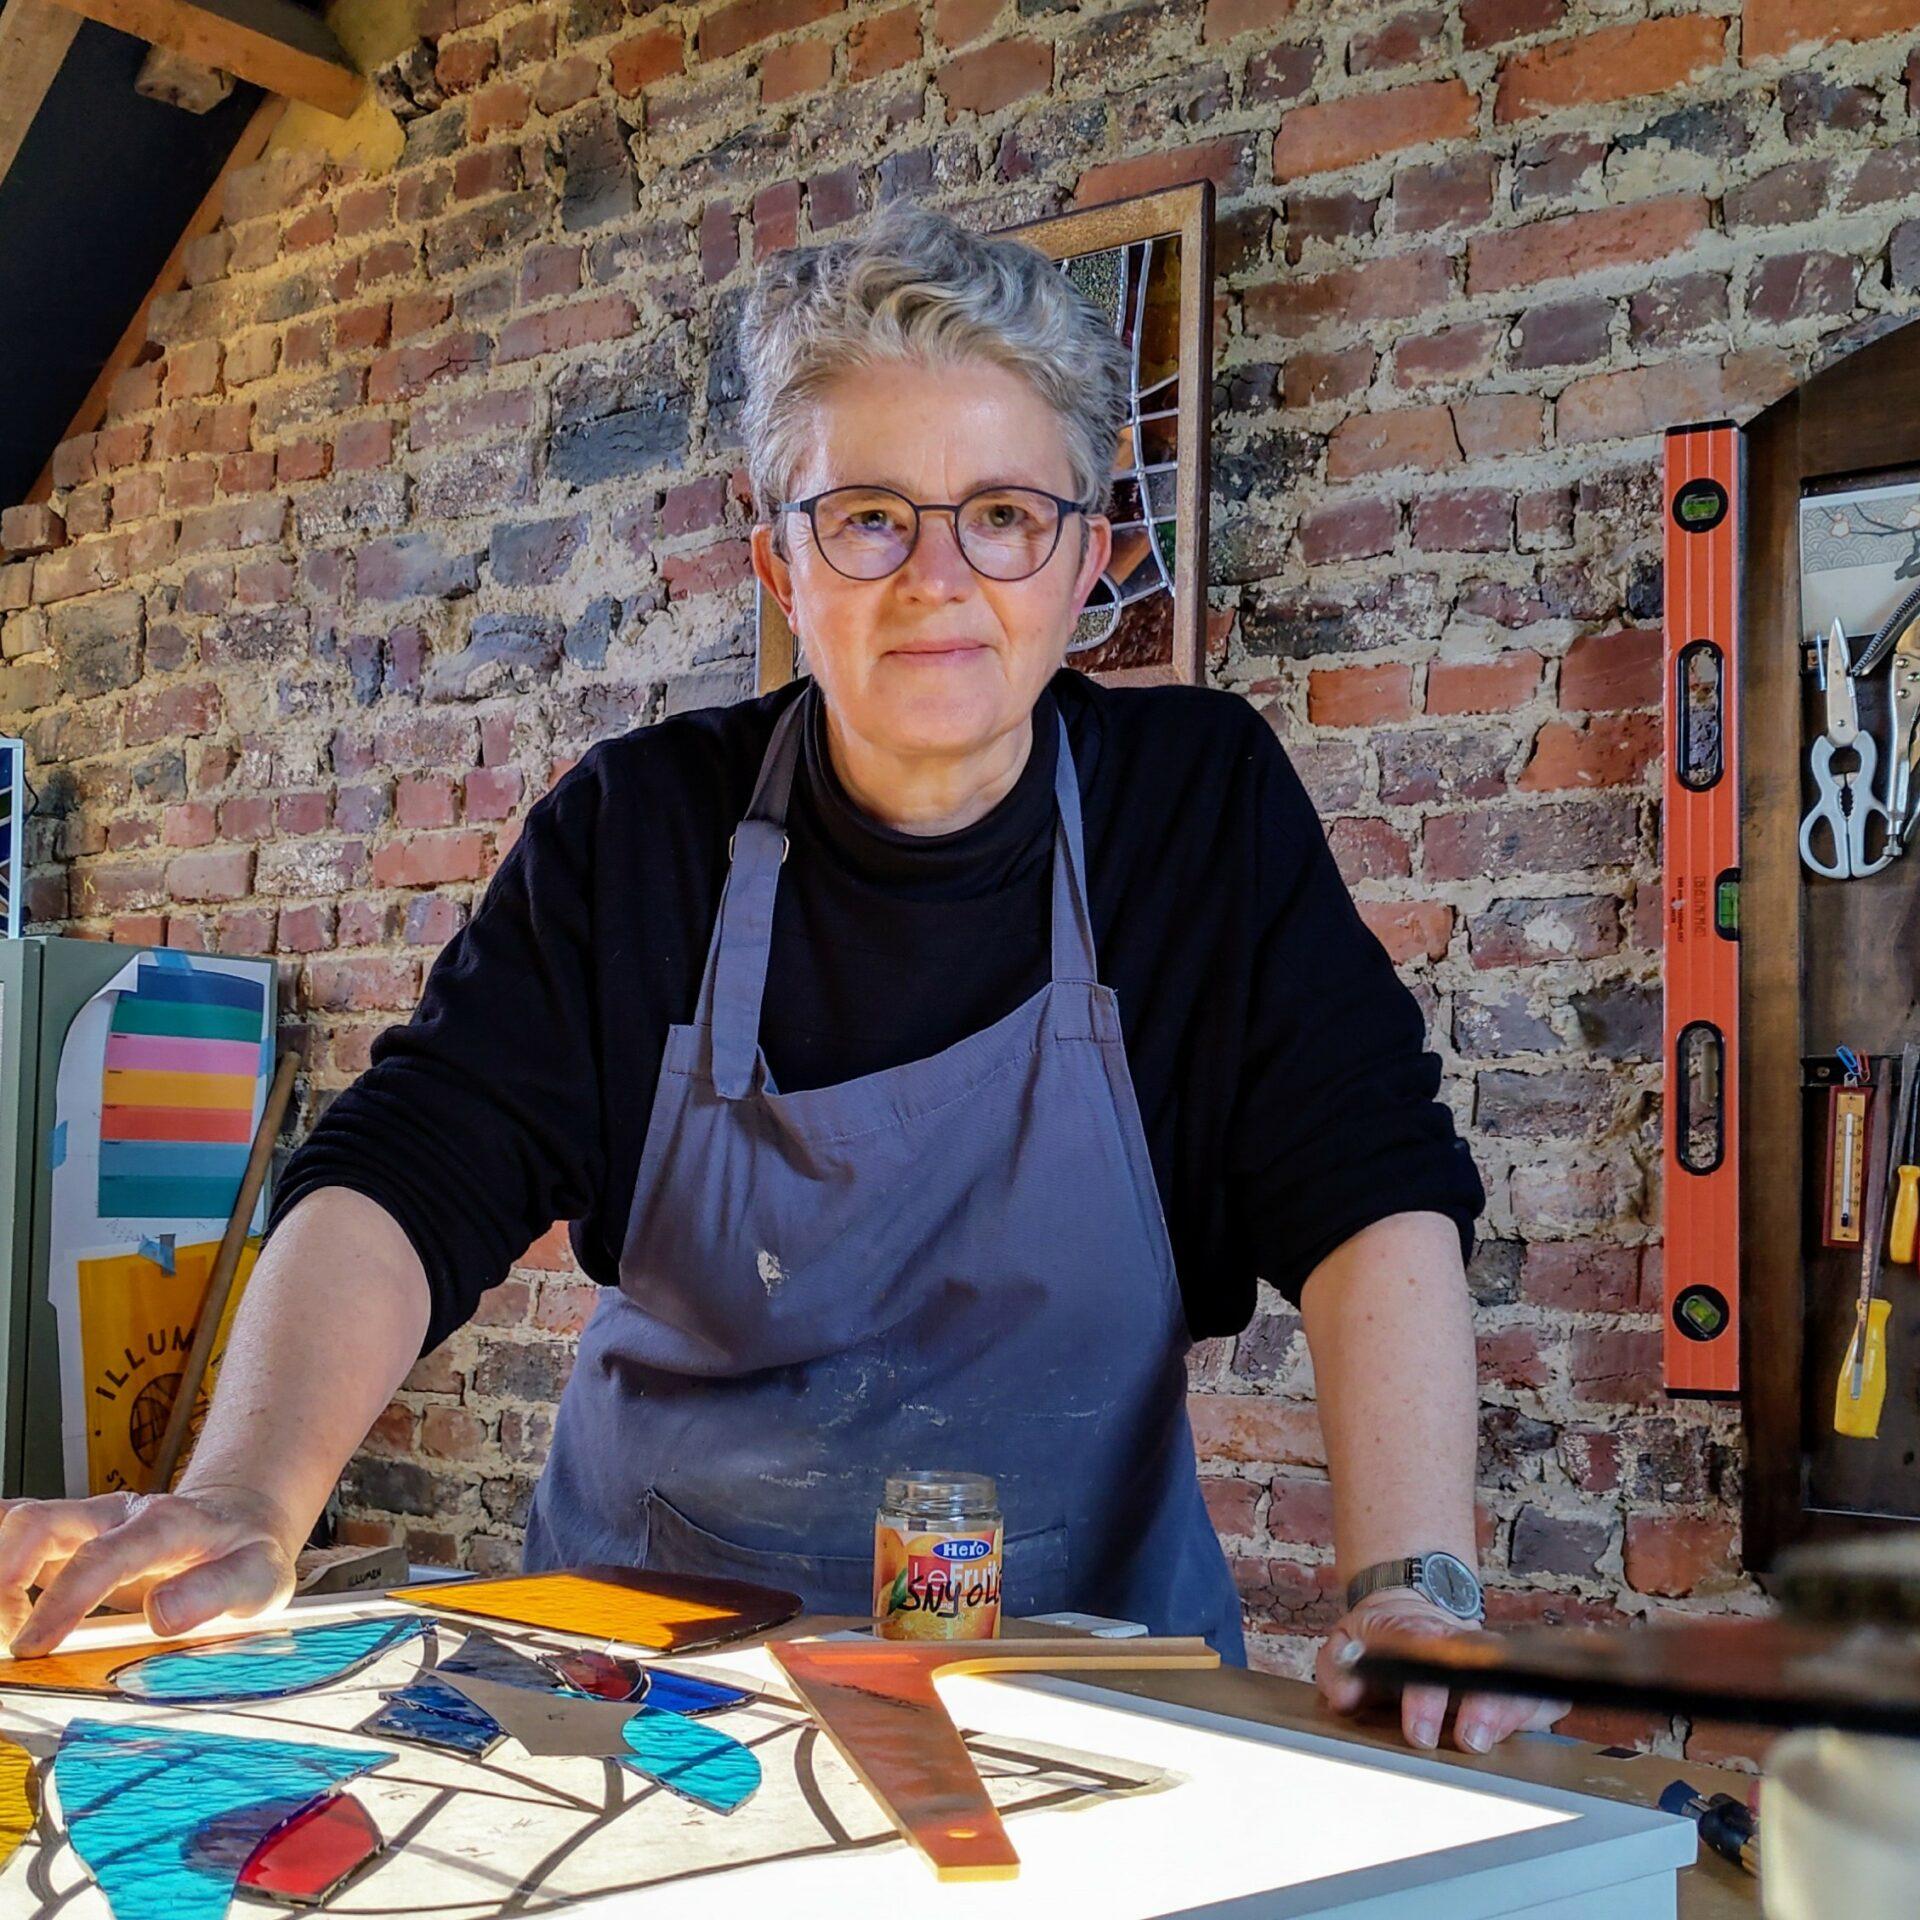 Isabelle Decallonne Atelier Illumen glasramen vitraux stained glass glafsraamdesigner